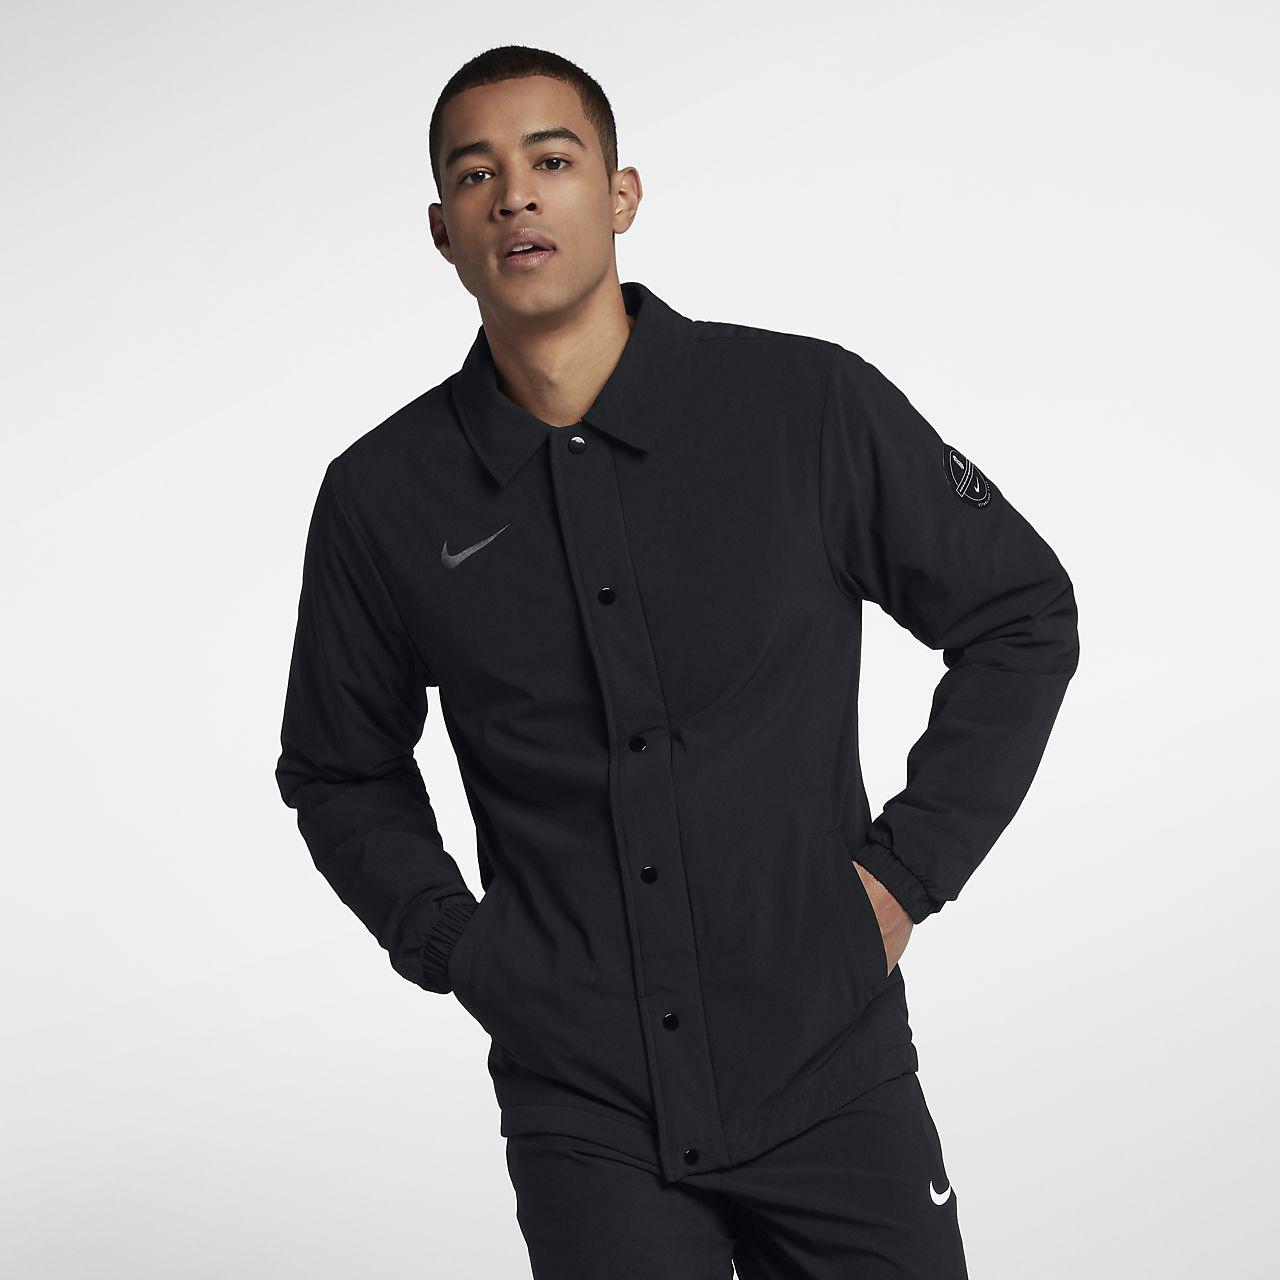 Nike De Kyrie Basketball Veste Homme Pour QCWredxBo